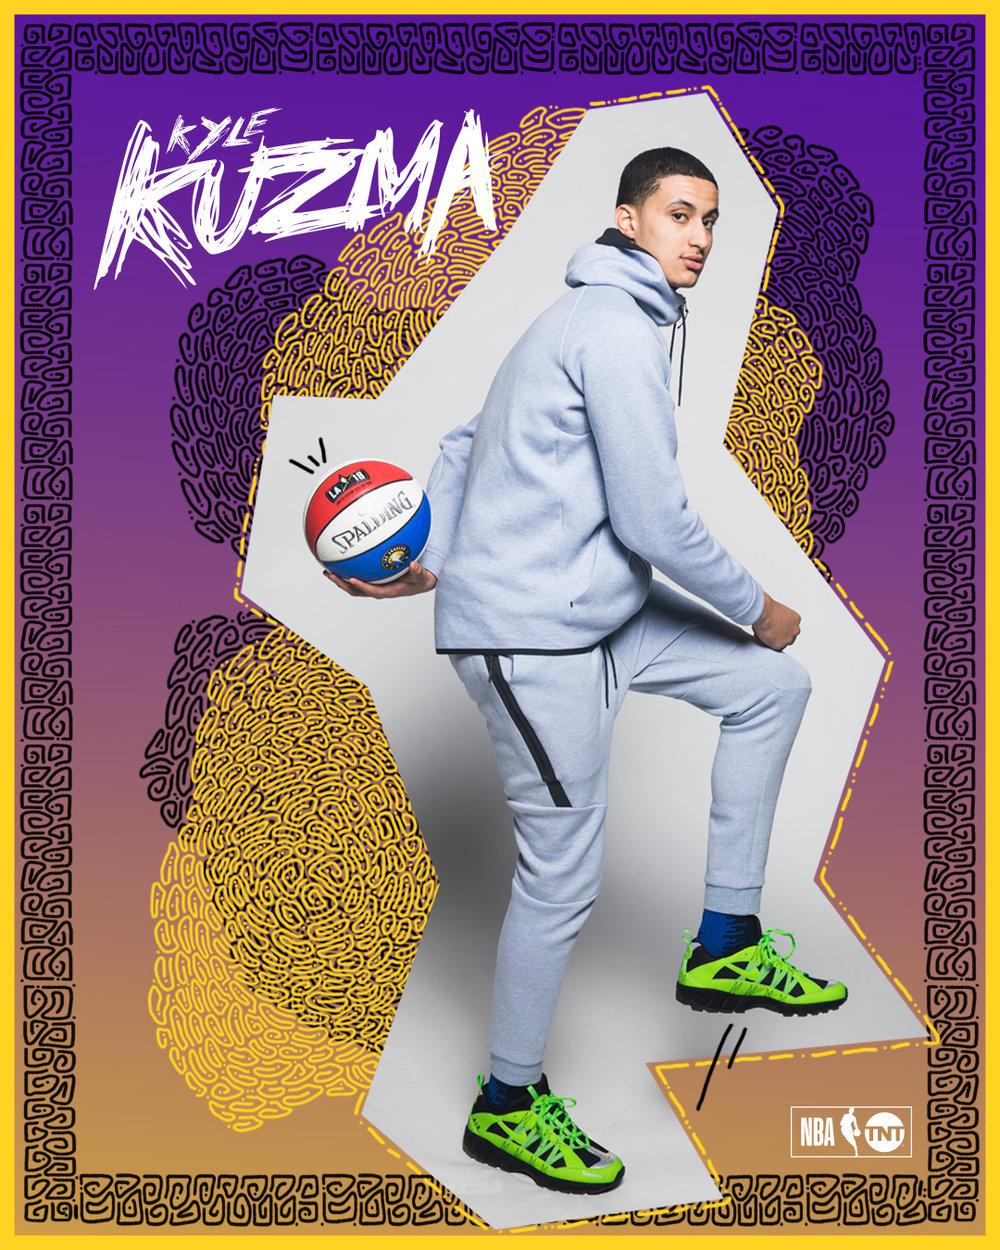 Kyle Kuzma for NBA TNT, All Star Weekend 2018